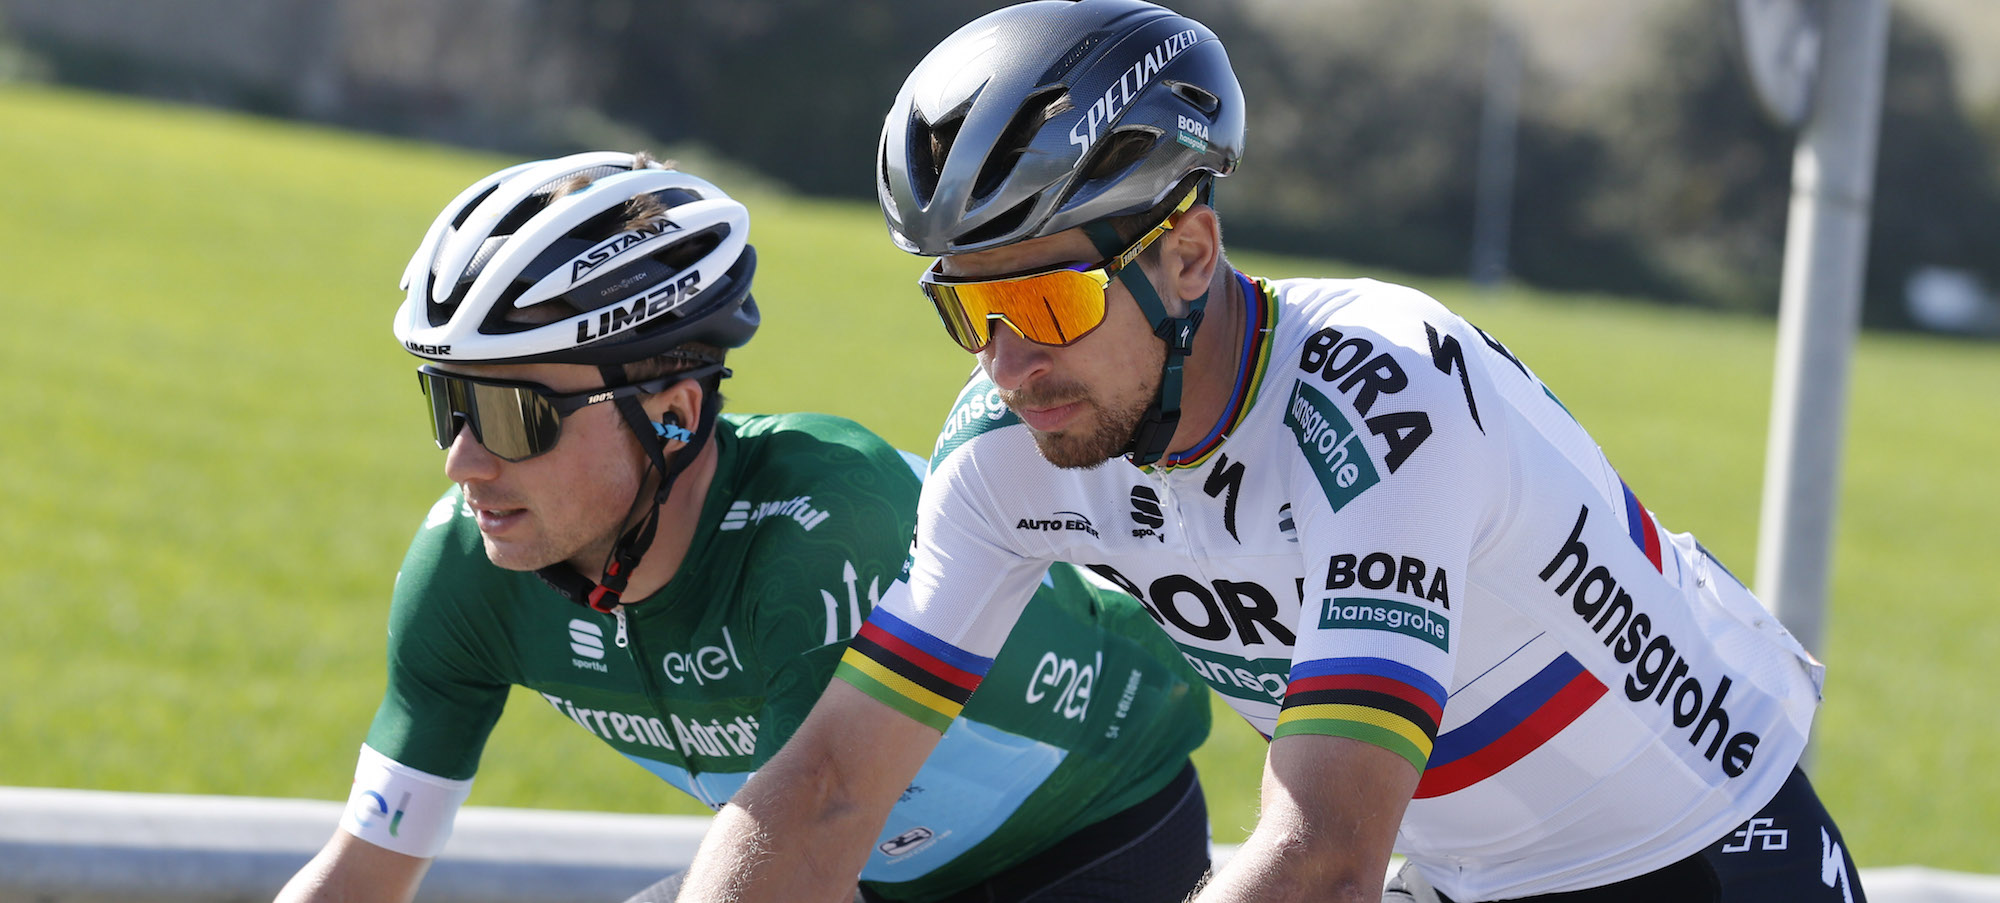 Peter Sagan content to wait to win  unpredictable  Milan-San Remo 68309af36